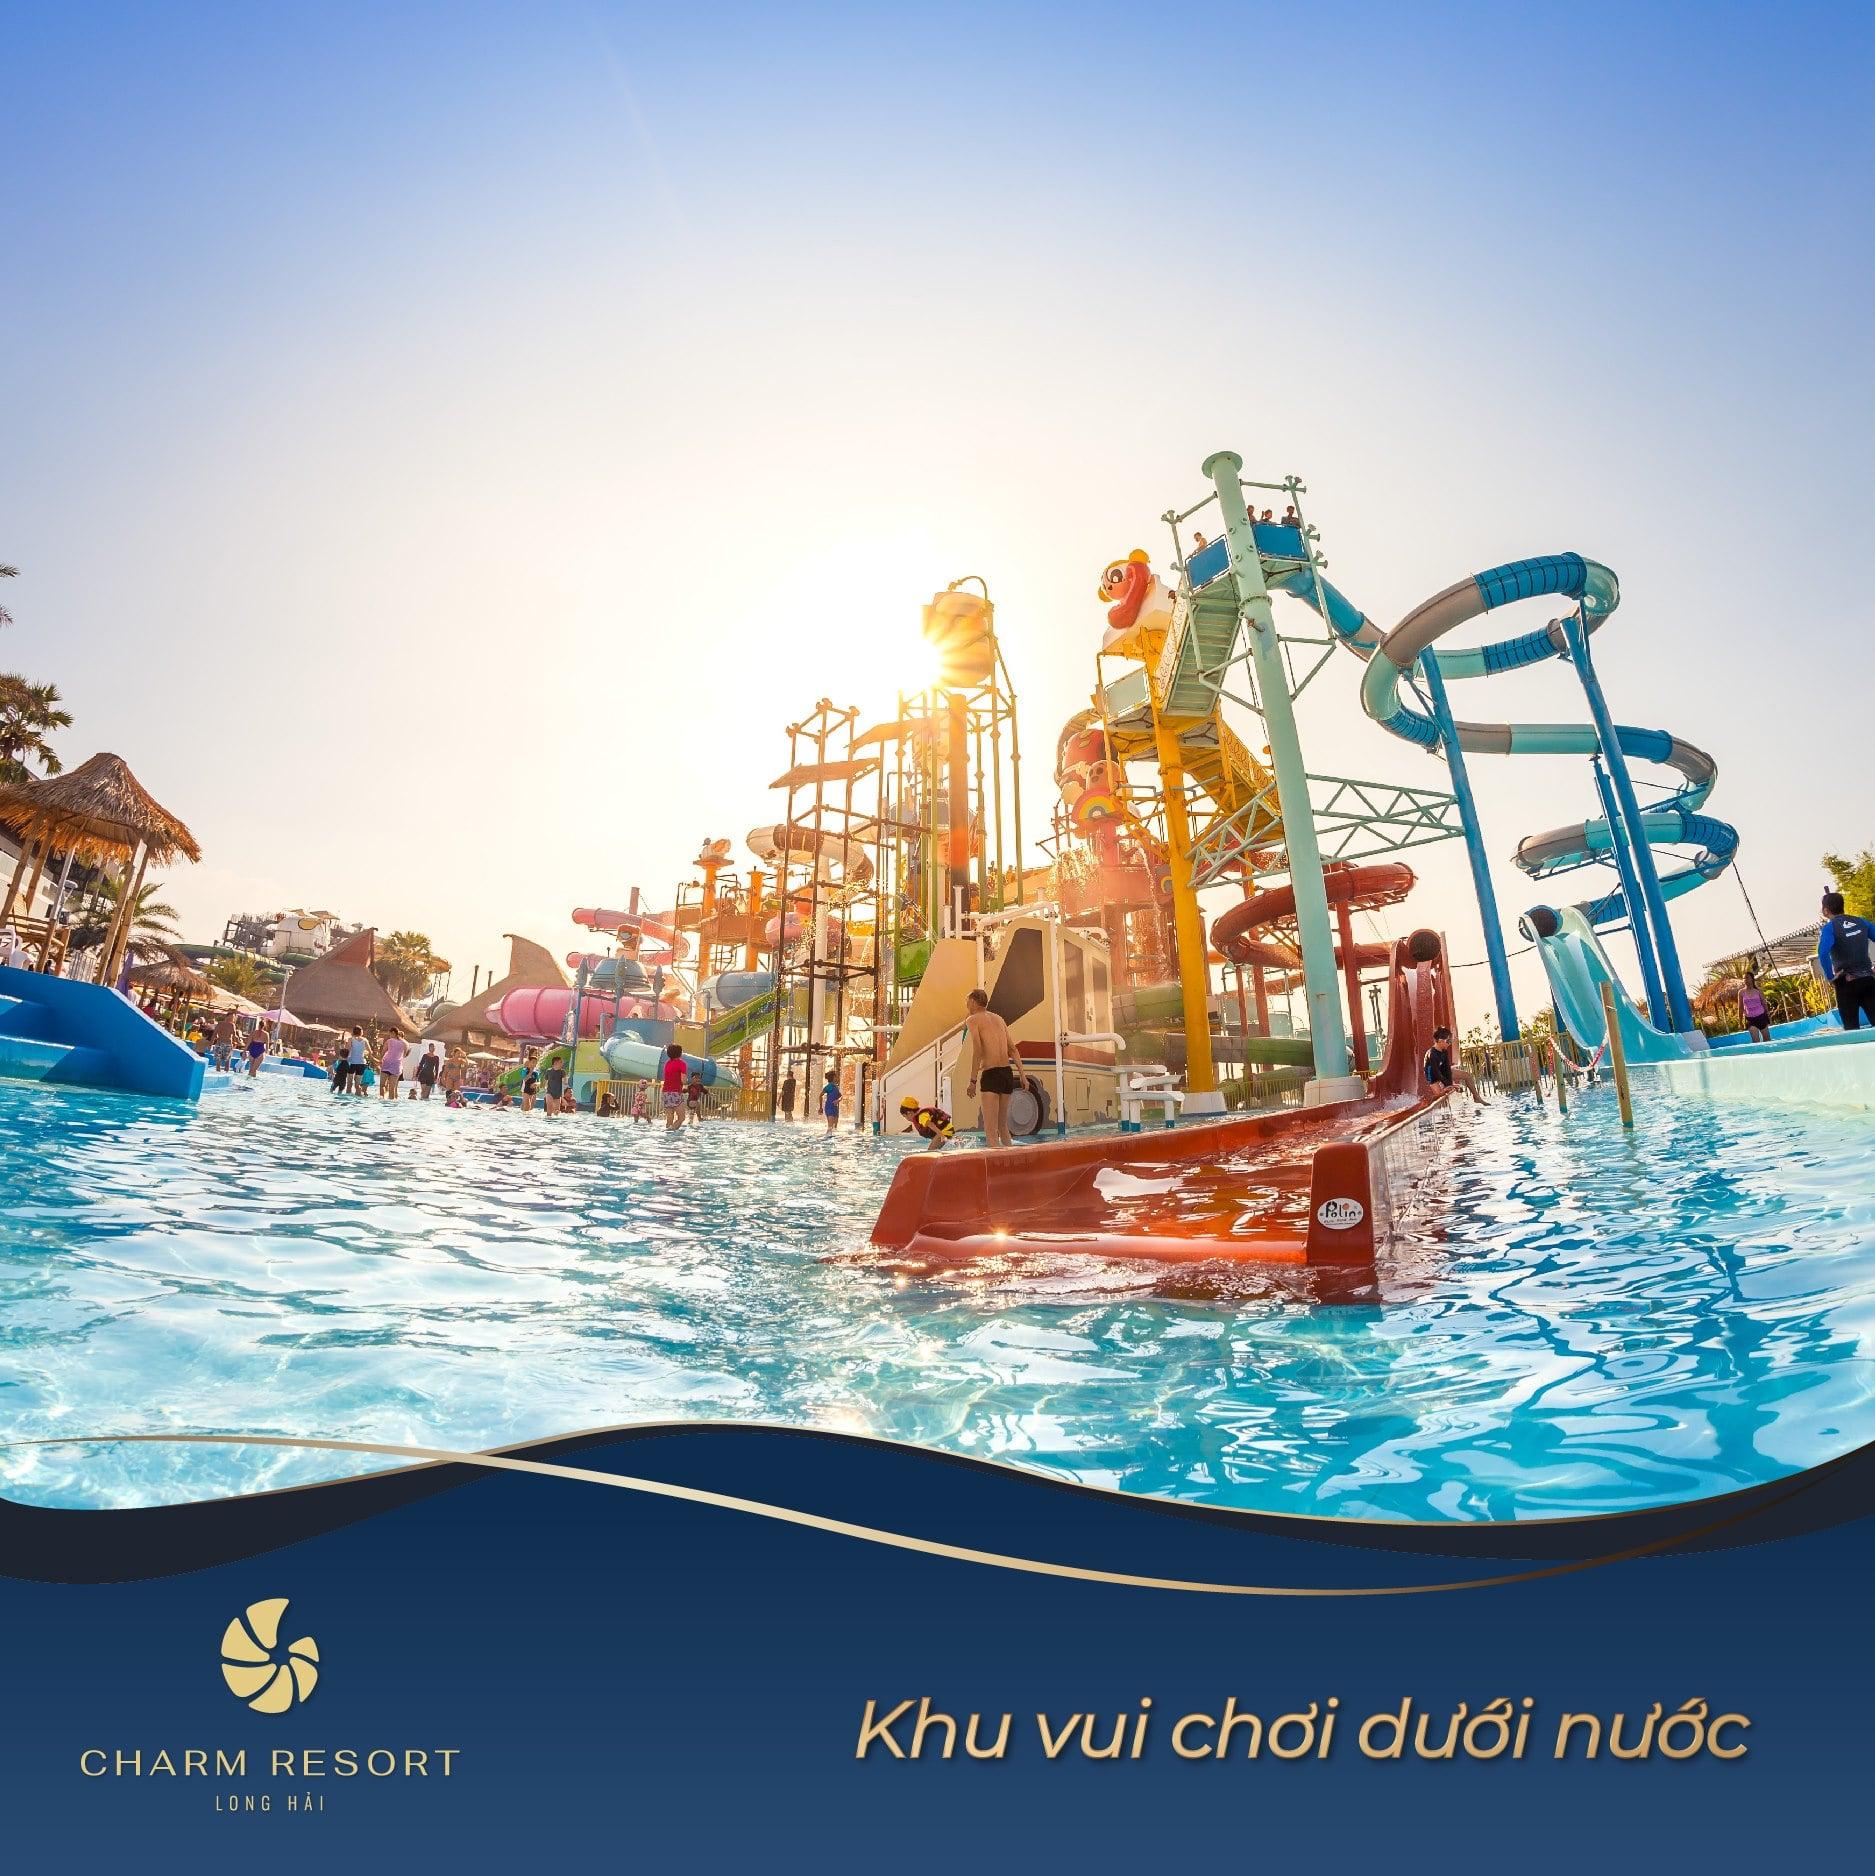 khu-vui-choi-duoi-nuoc-charm-resort-long-hai